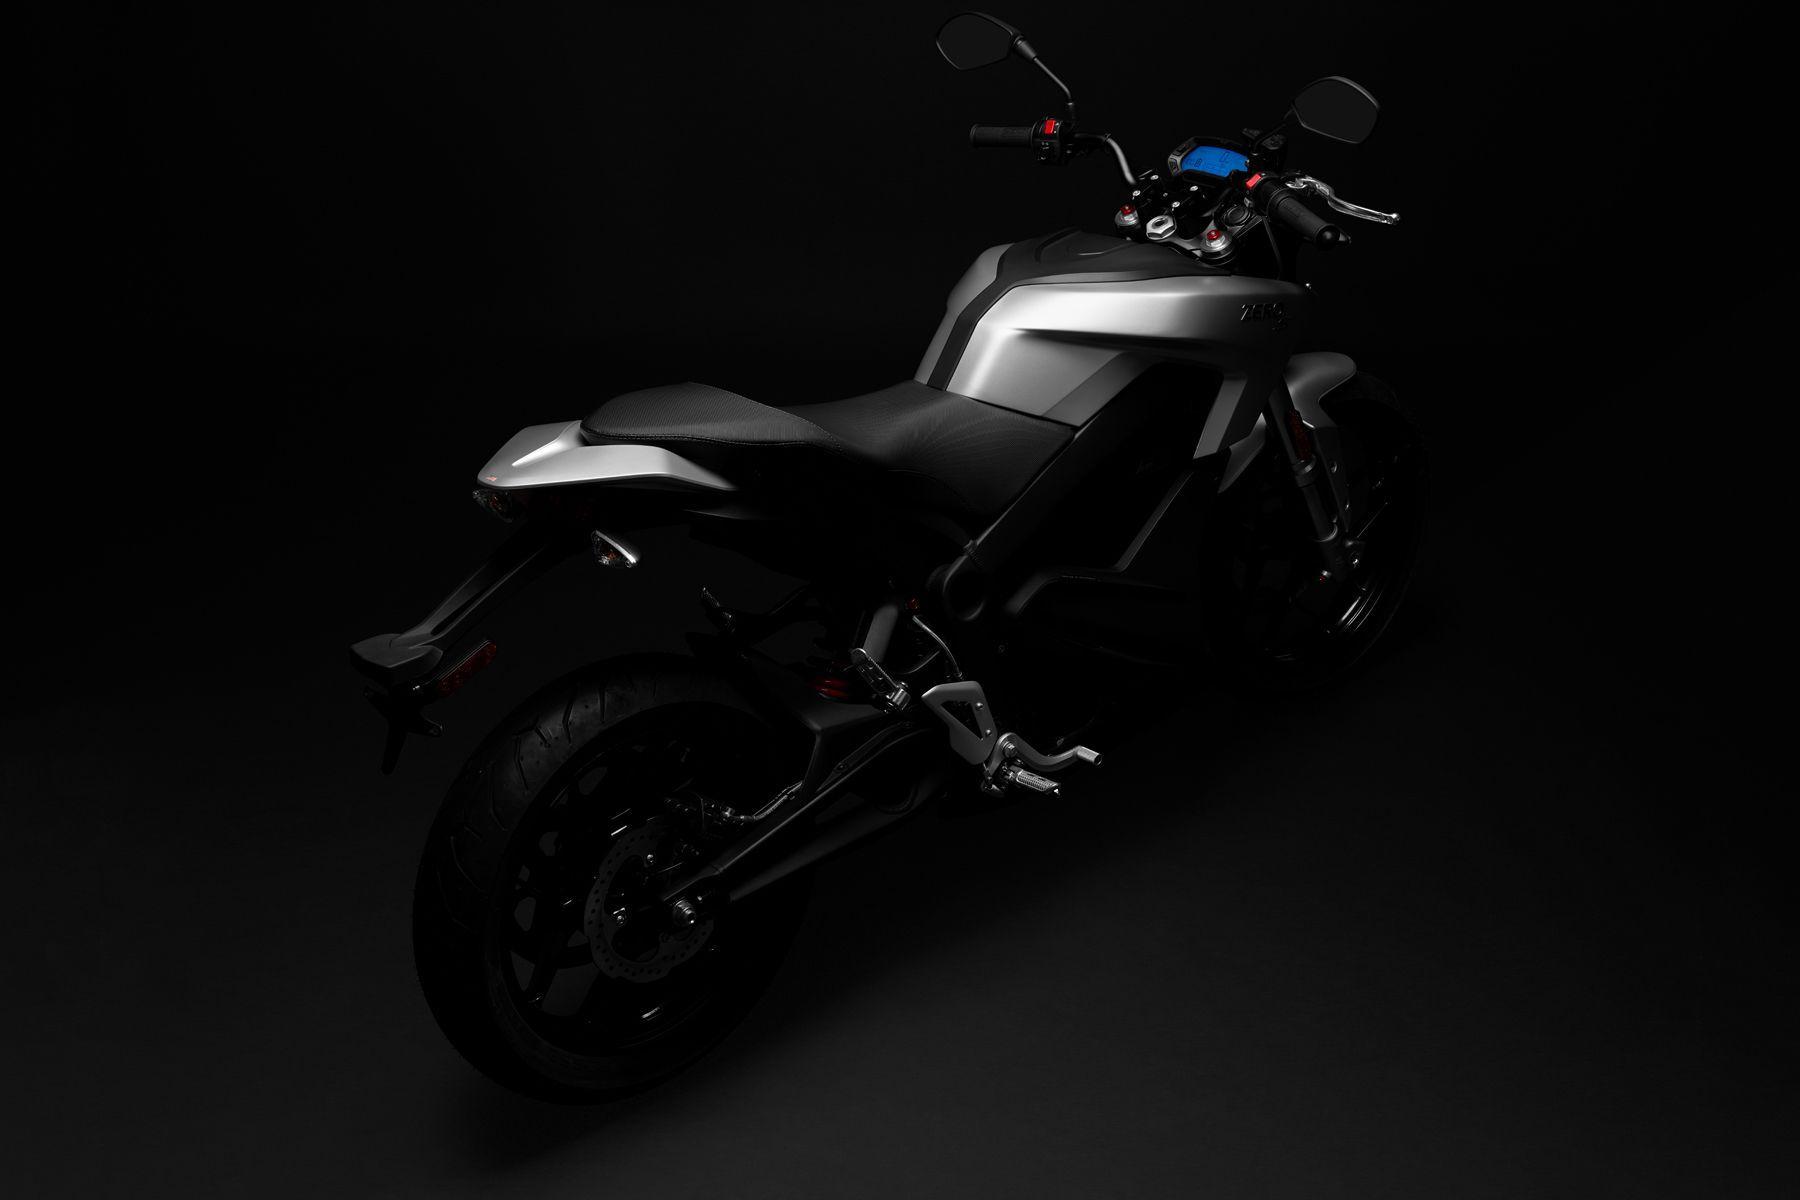 lit motorcycle details